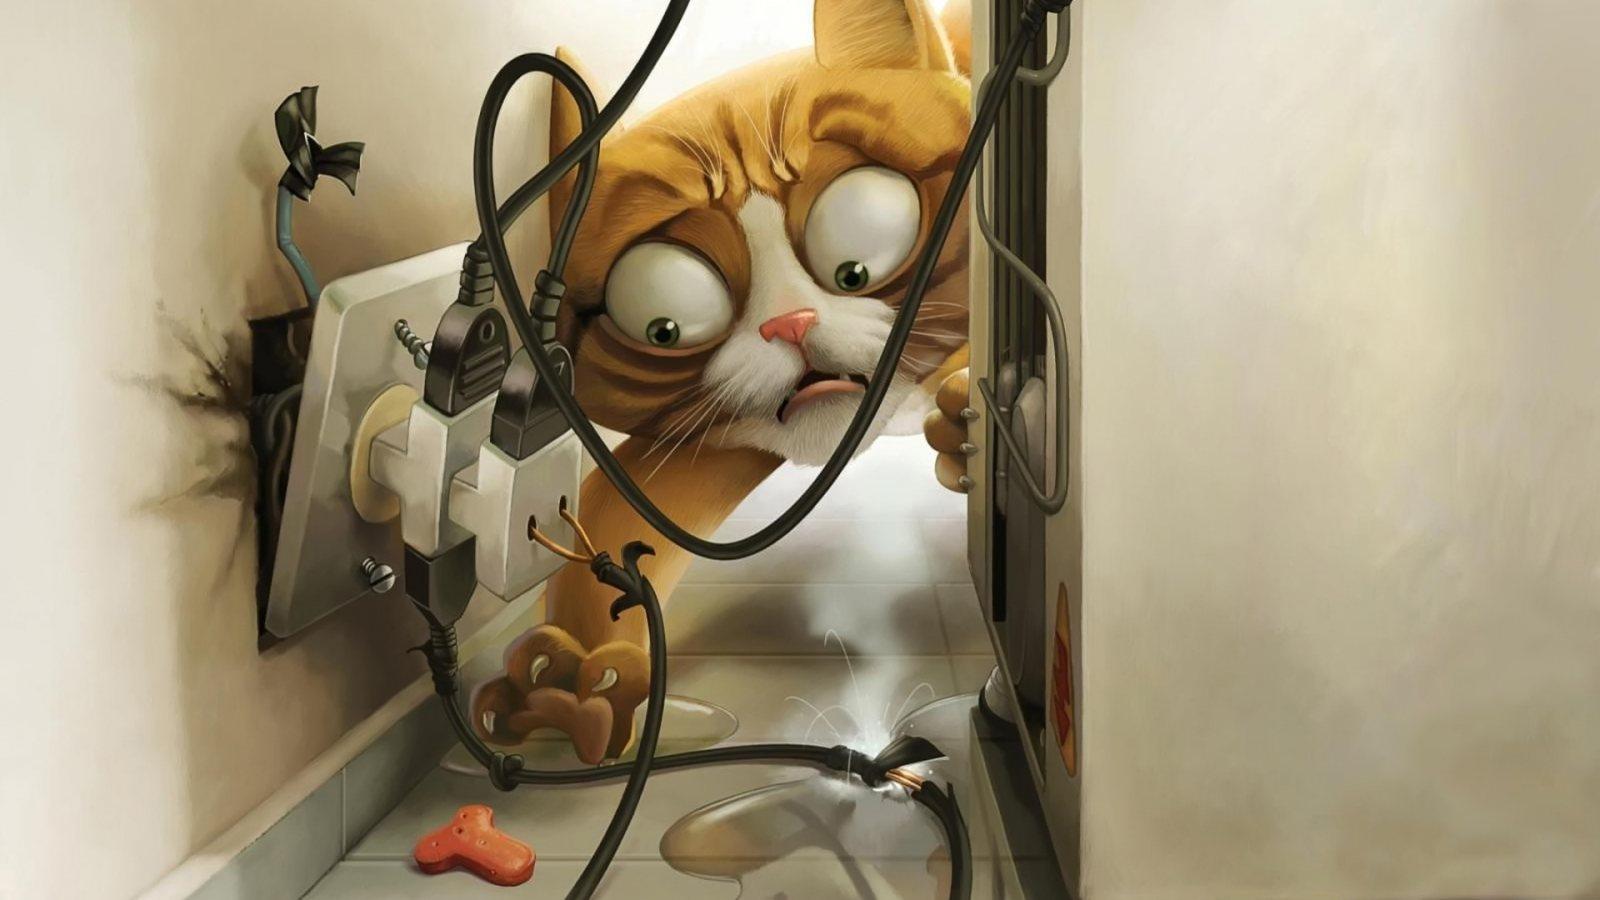 http://1.bp.blogspot.com/-cI790a56TsA/T0ZqM3TlpQI/AAAAAAAAGP4/8KoFwmHWVyc/s1600/Crazy%2Bcat.jpg